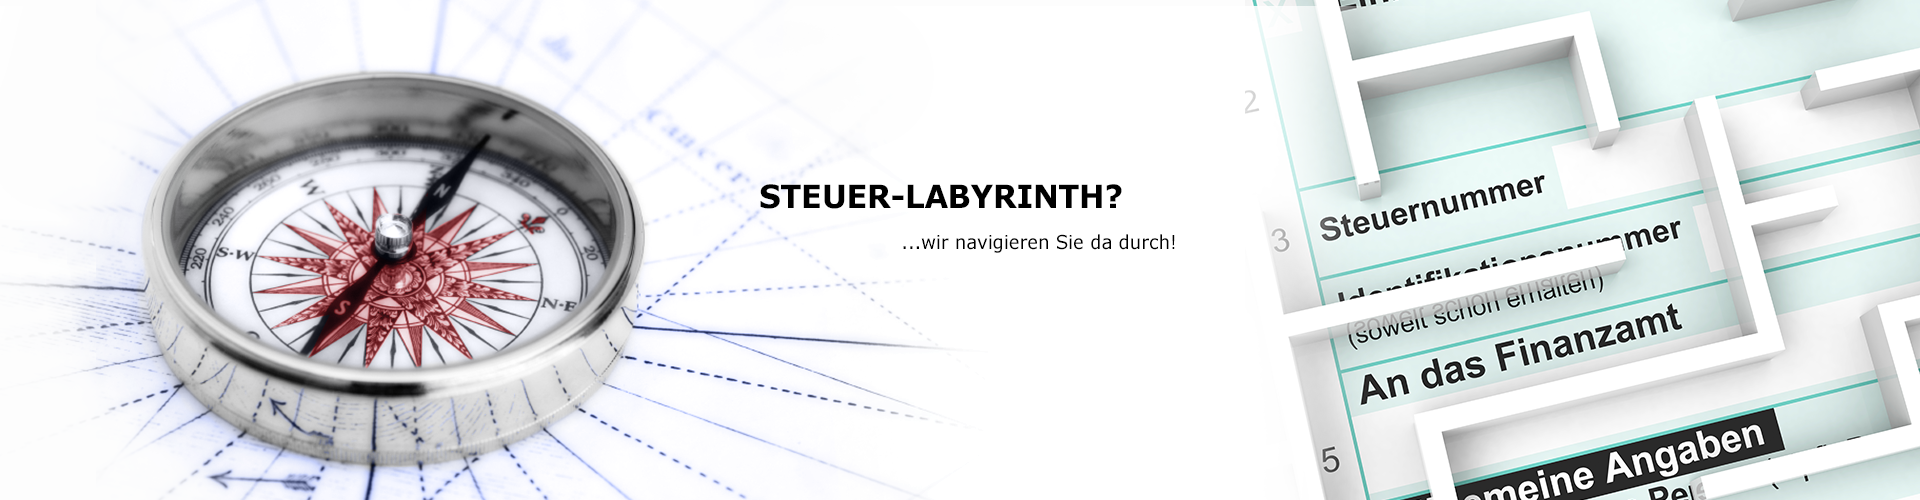 steuern-labyrinth